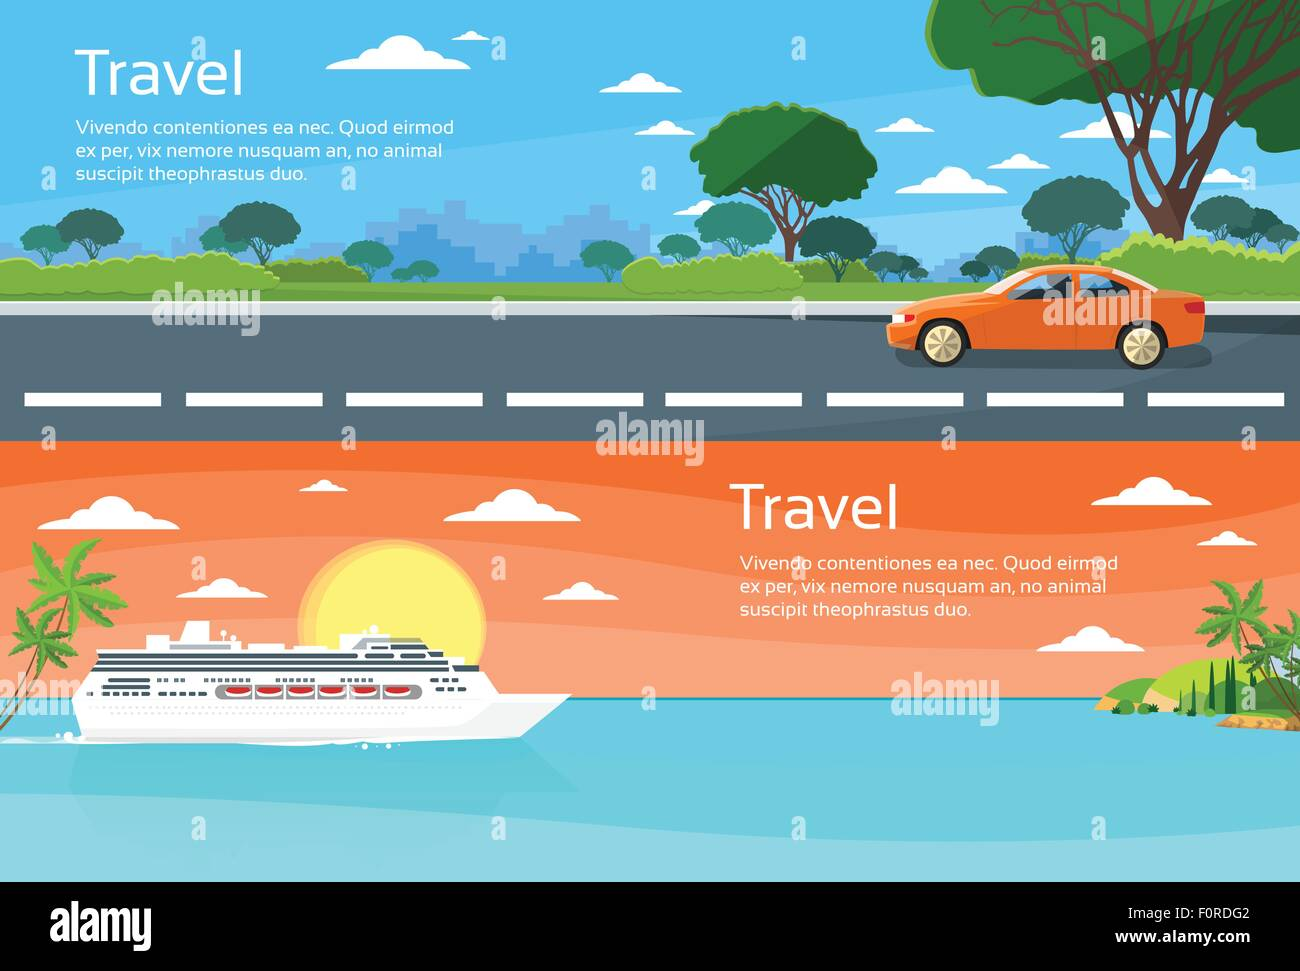 Travel Web Banner Car Drive Road Cruise Ship Liner Tropical Island Stock Vector Image Art Alamy